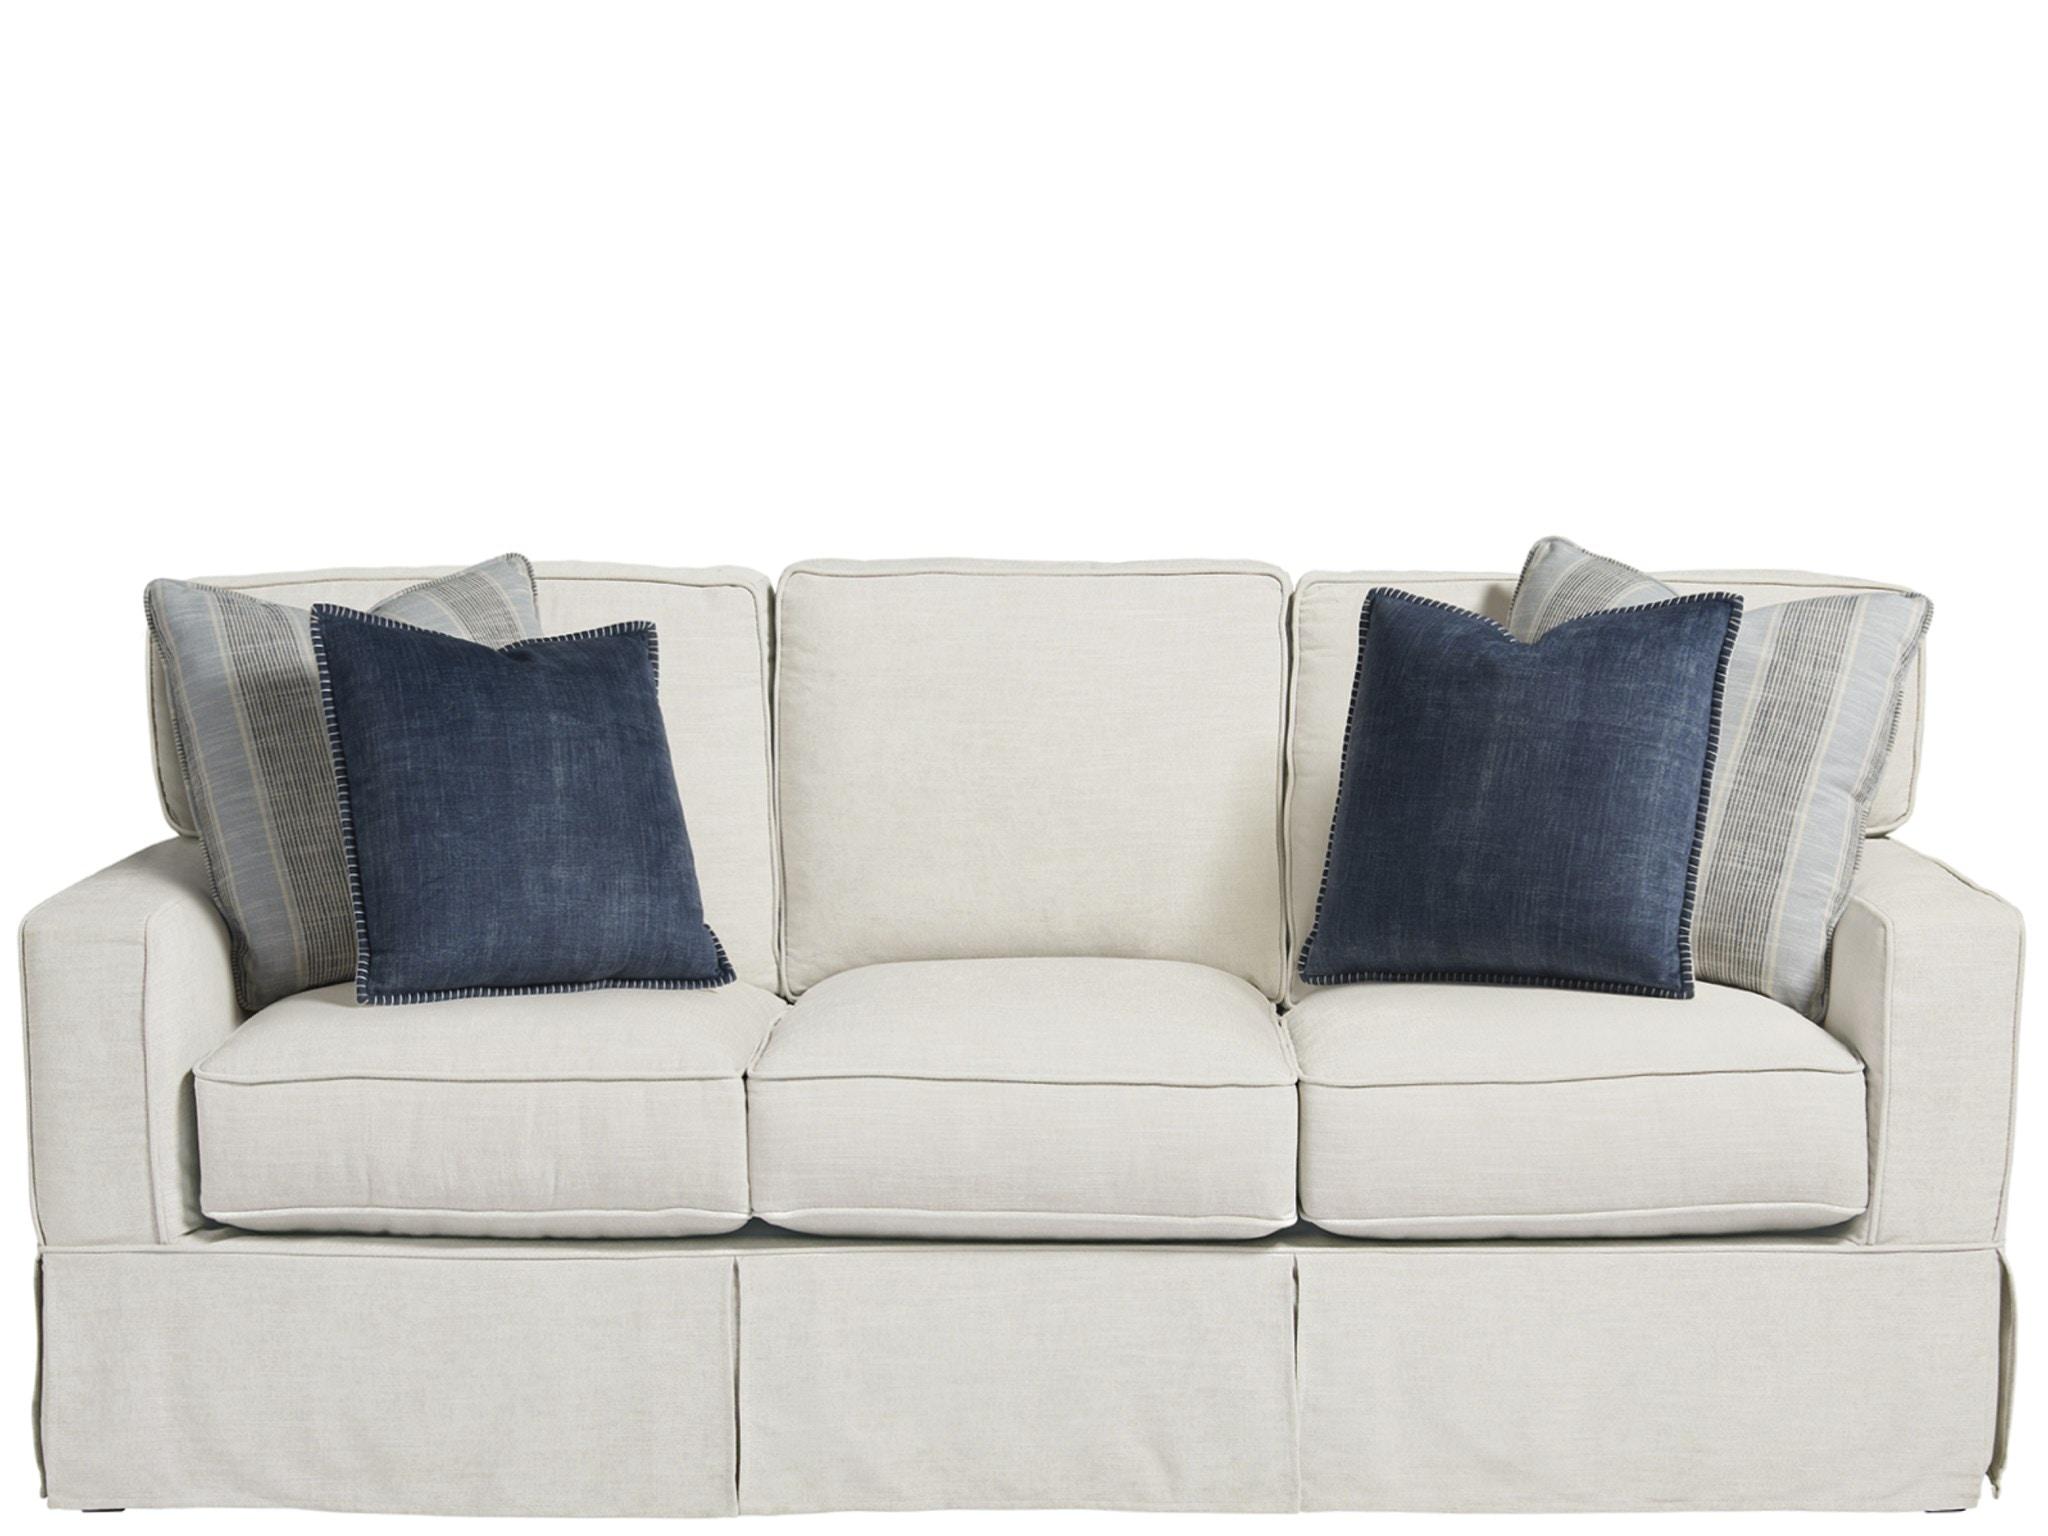 Living Room Sofas Matter Brothers Furniture Fort Myers Sarasota